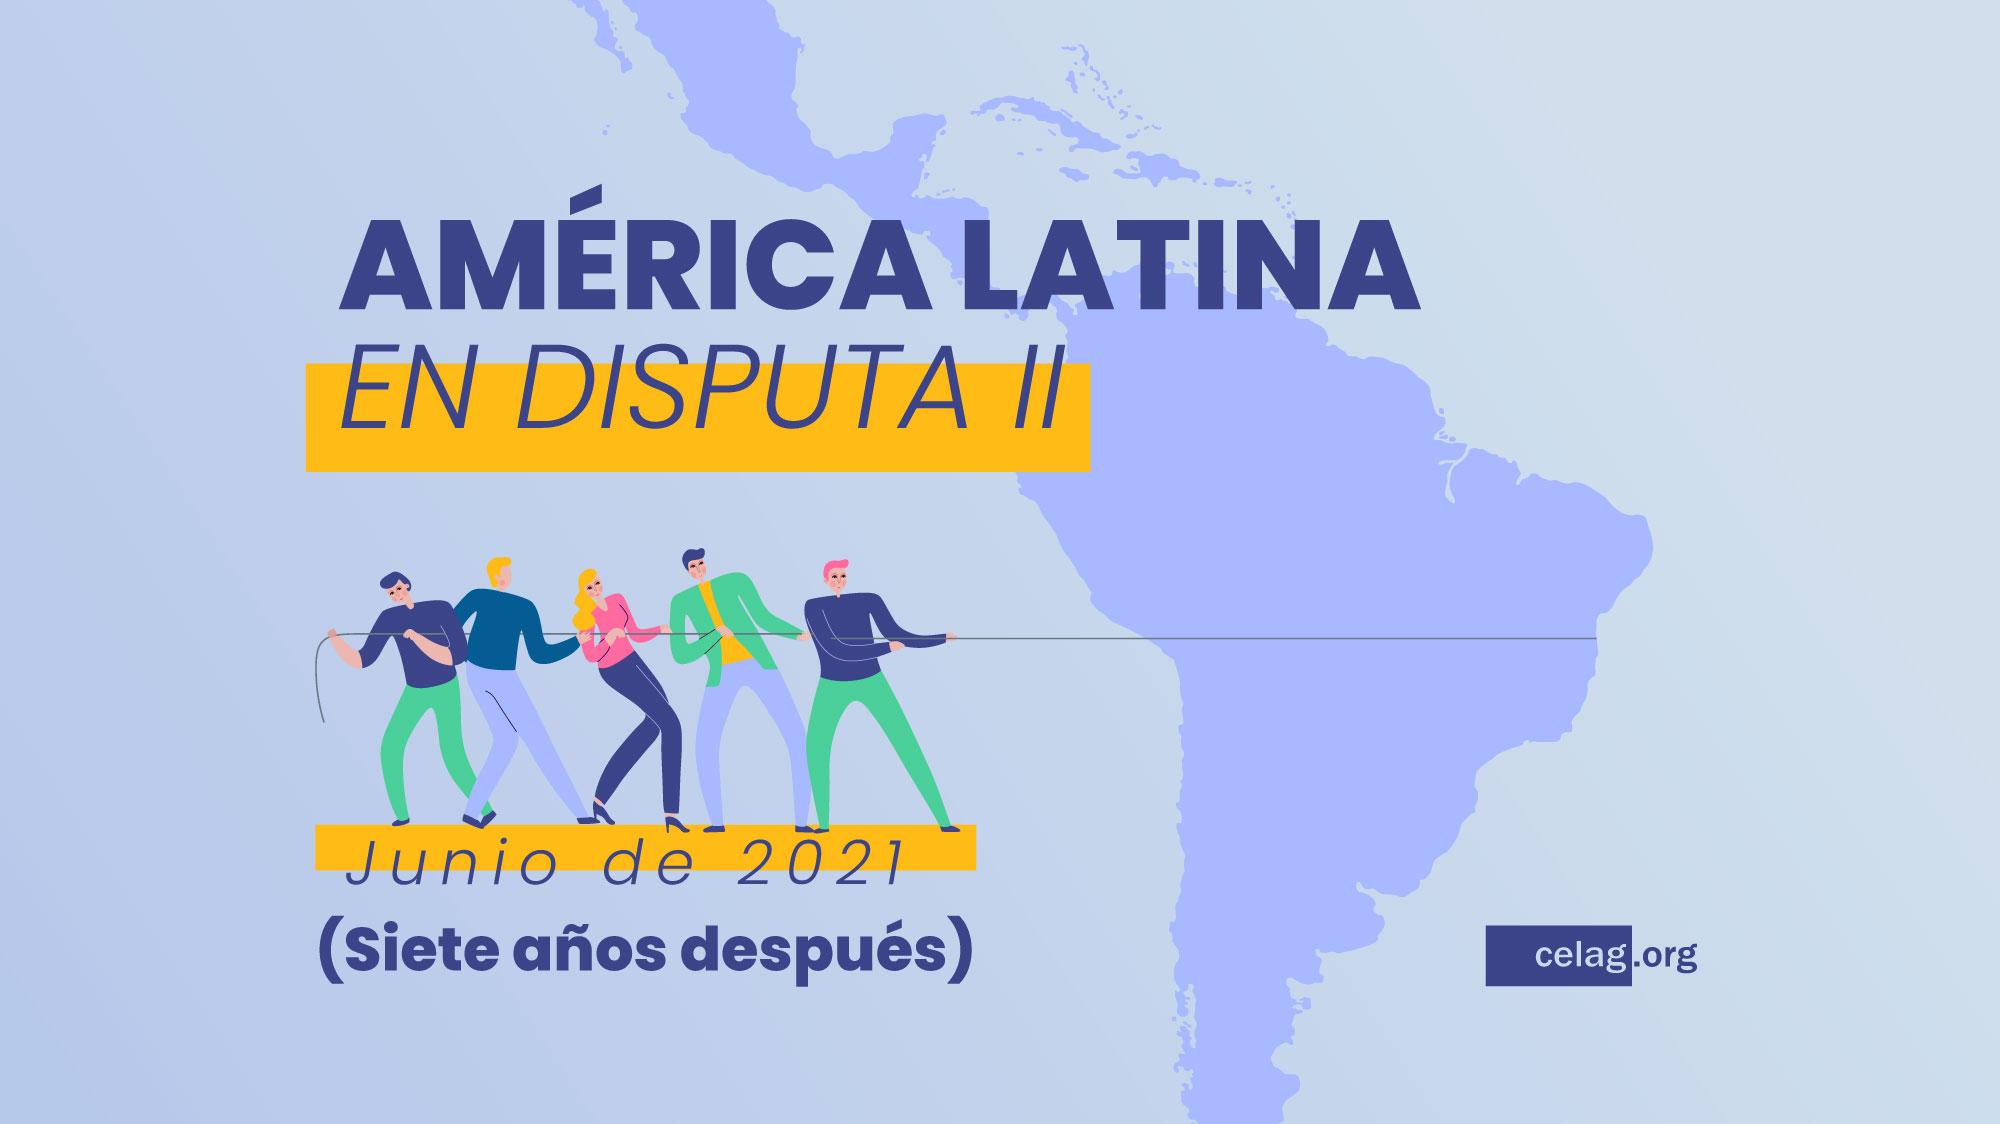 América Latina en disputa Centro Estratégico Latinoamericano de Geopolítica (CELAG)